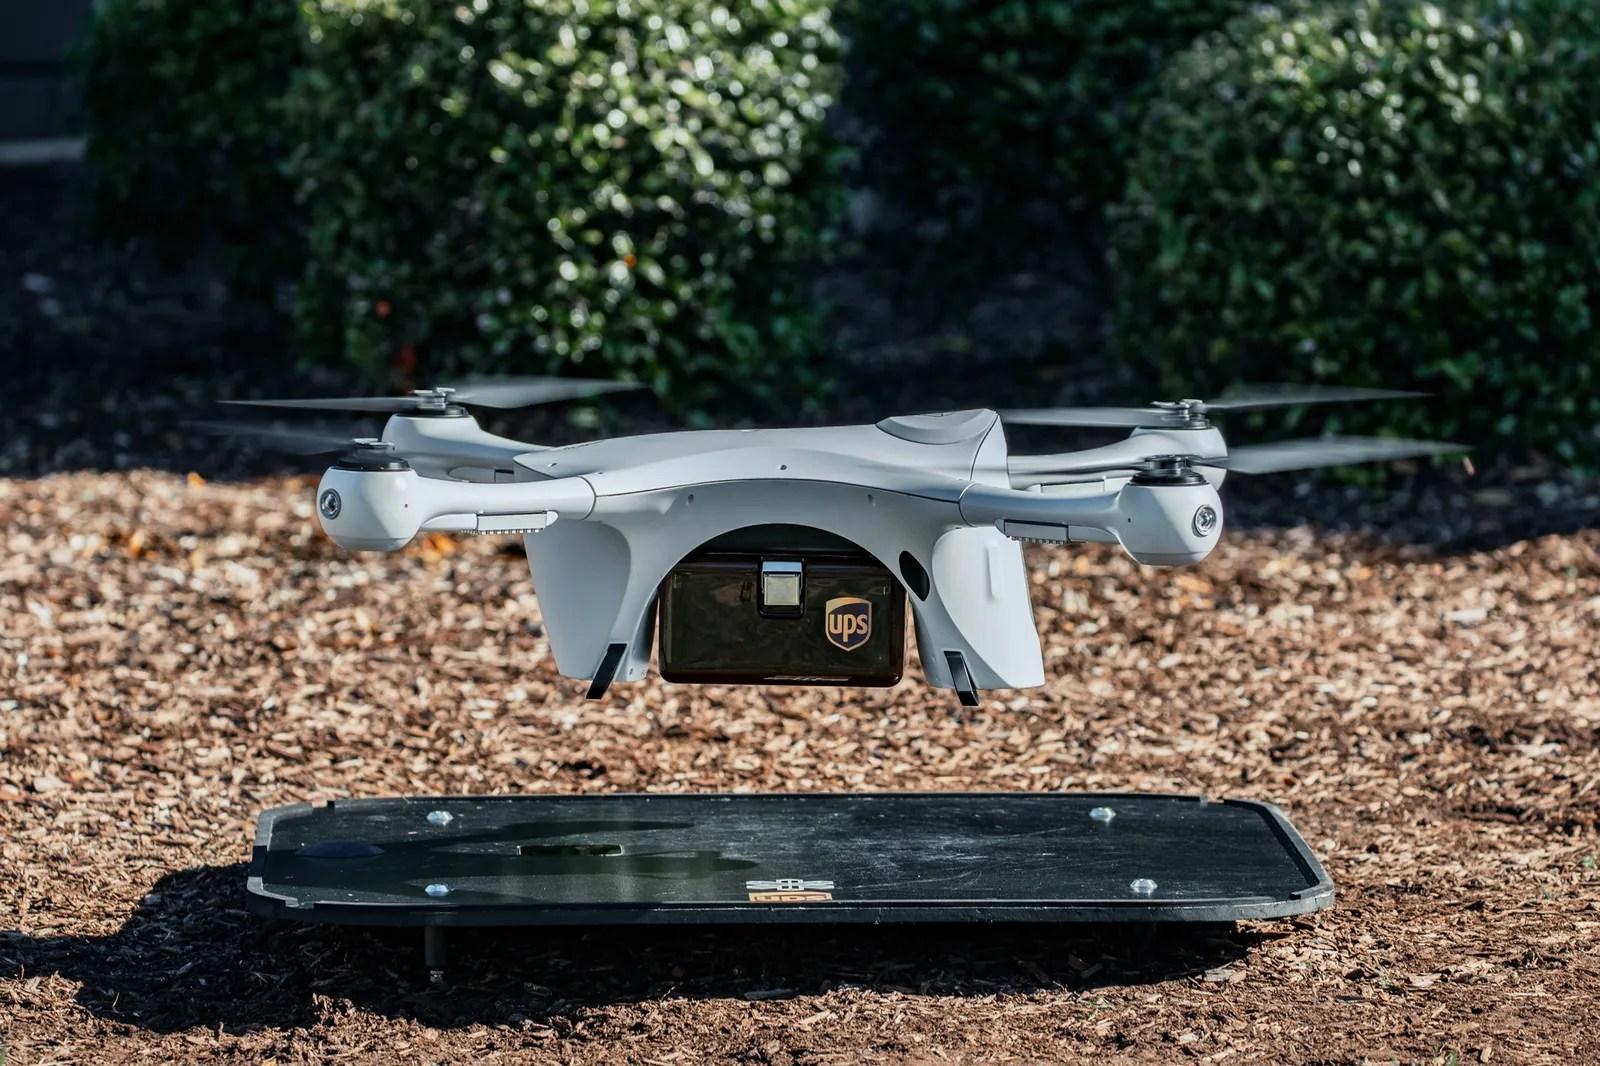 a landing drone